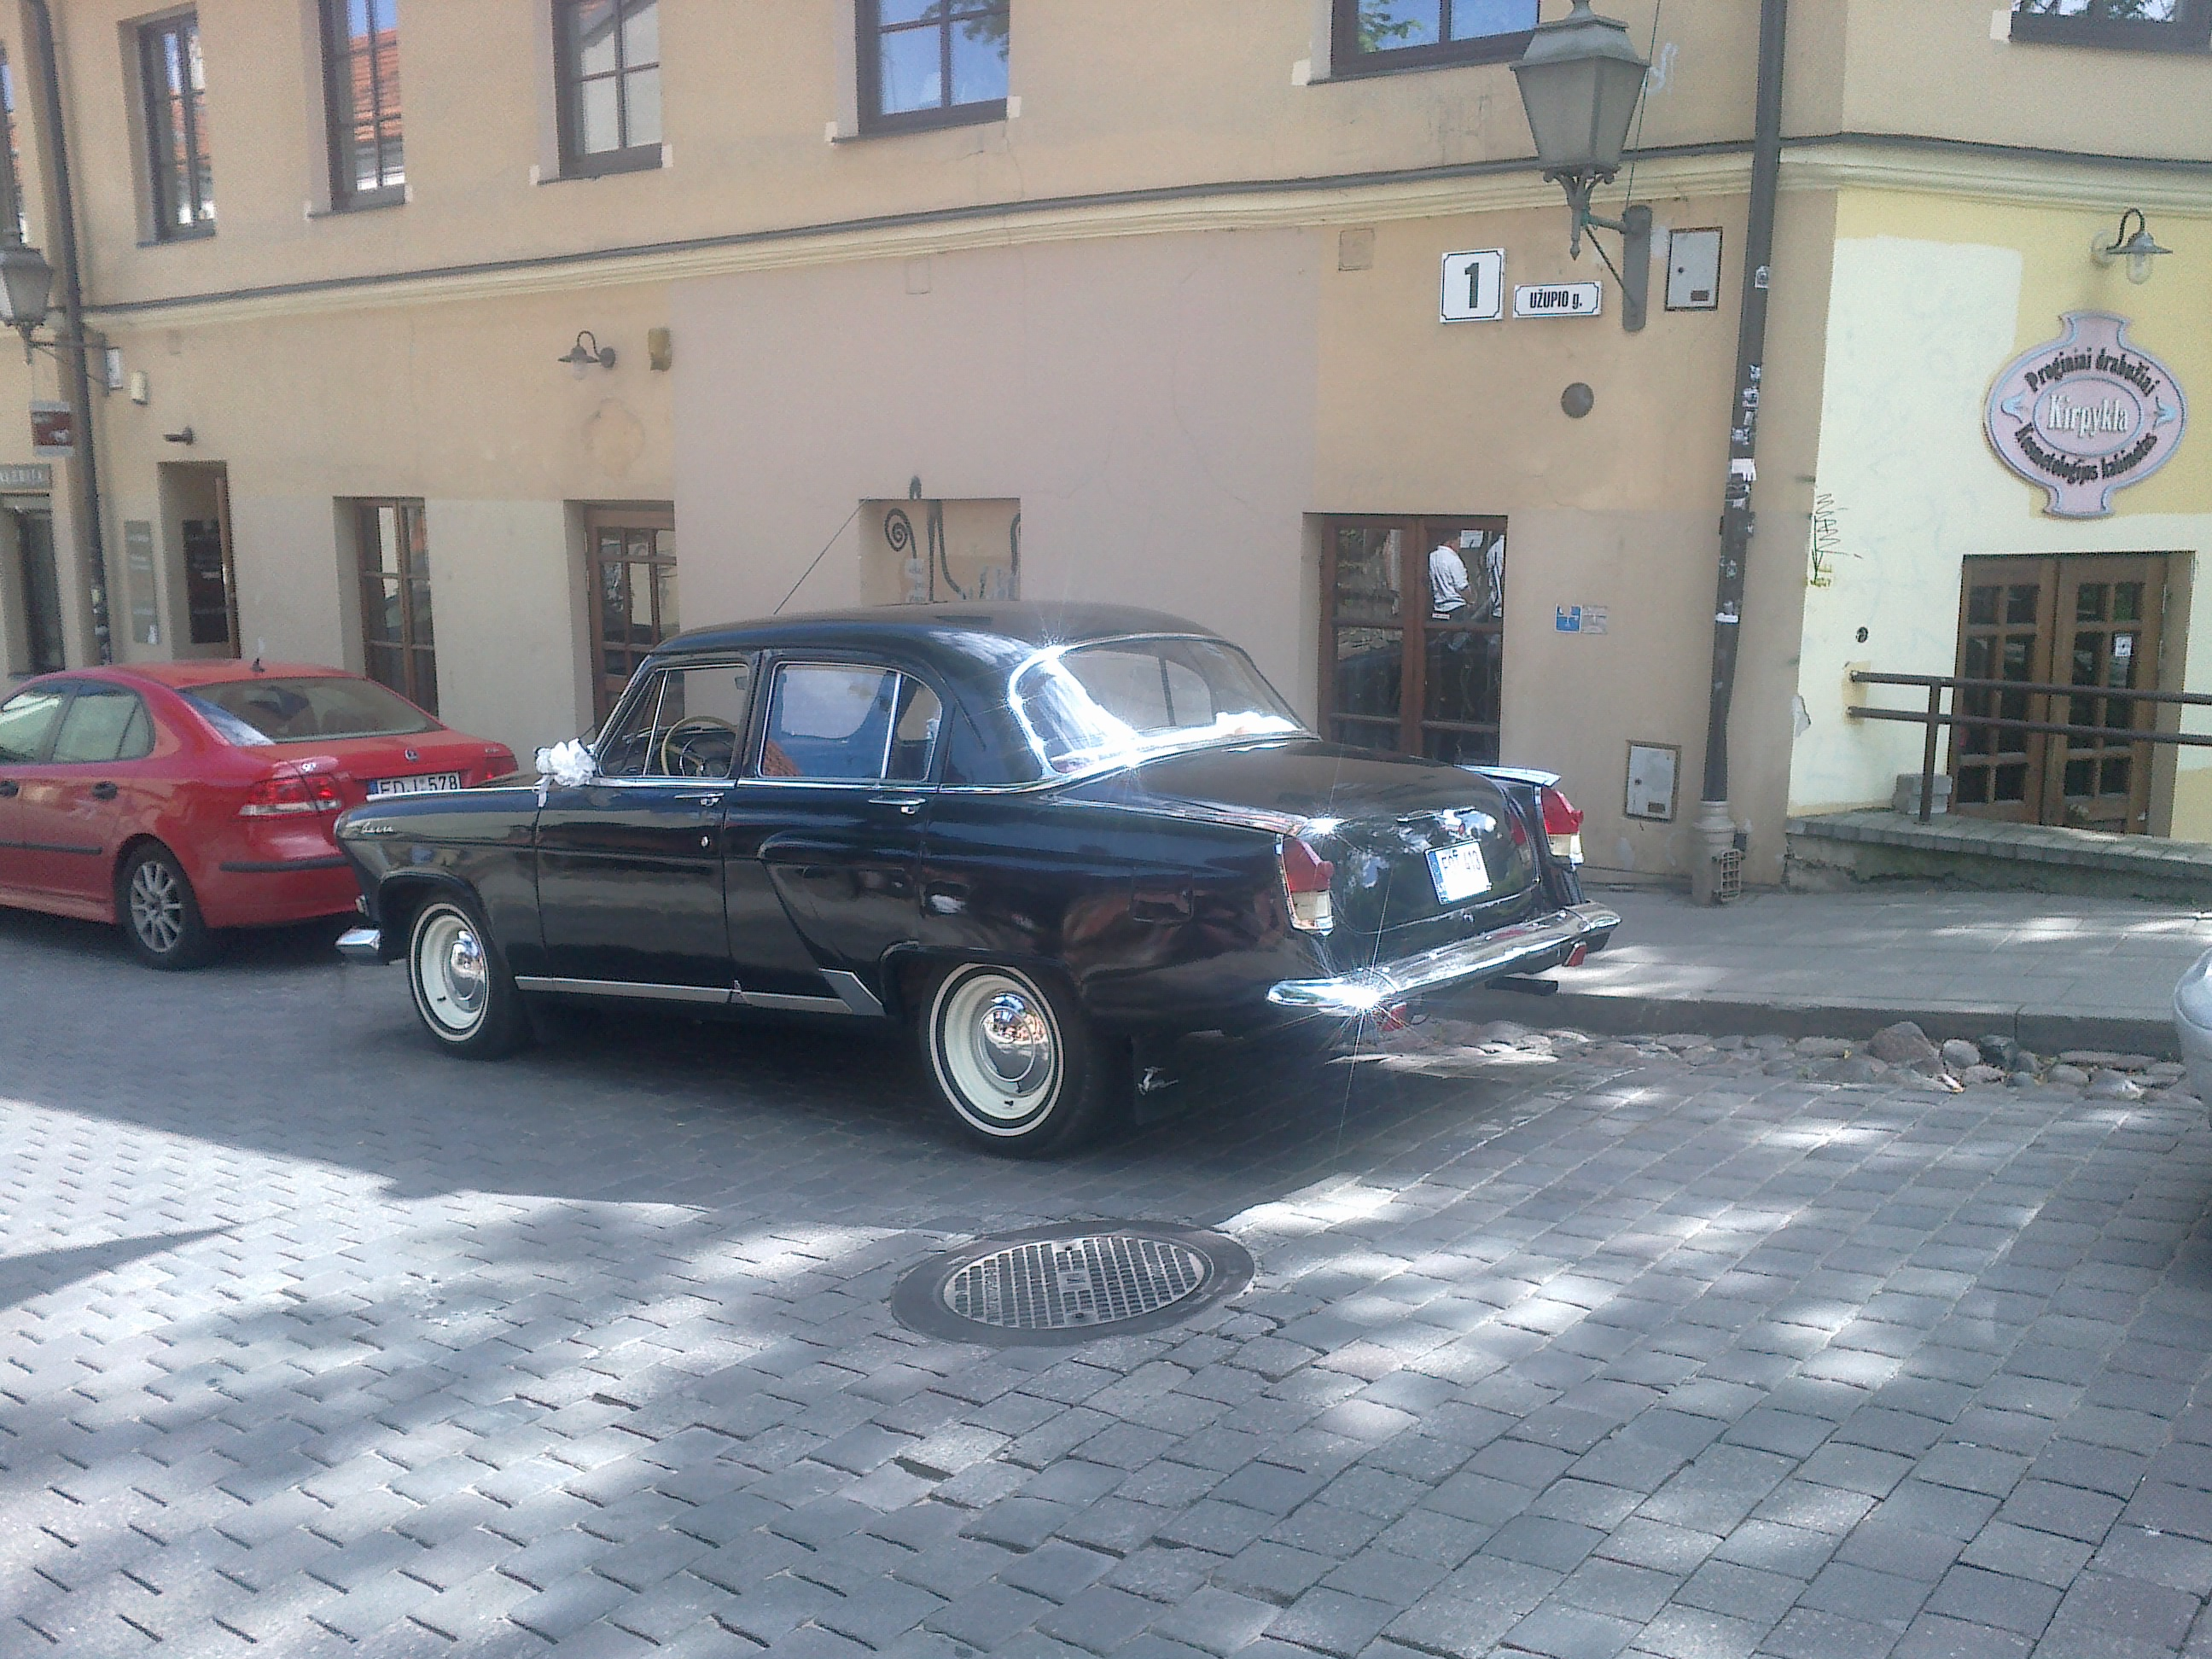 GAZ 21 Volga 1967m. 4 vietų automobilio nuoma Vilniuje